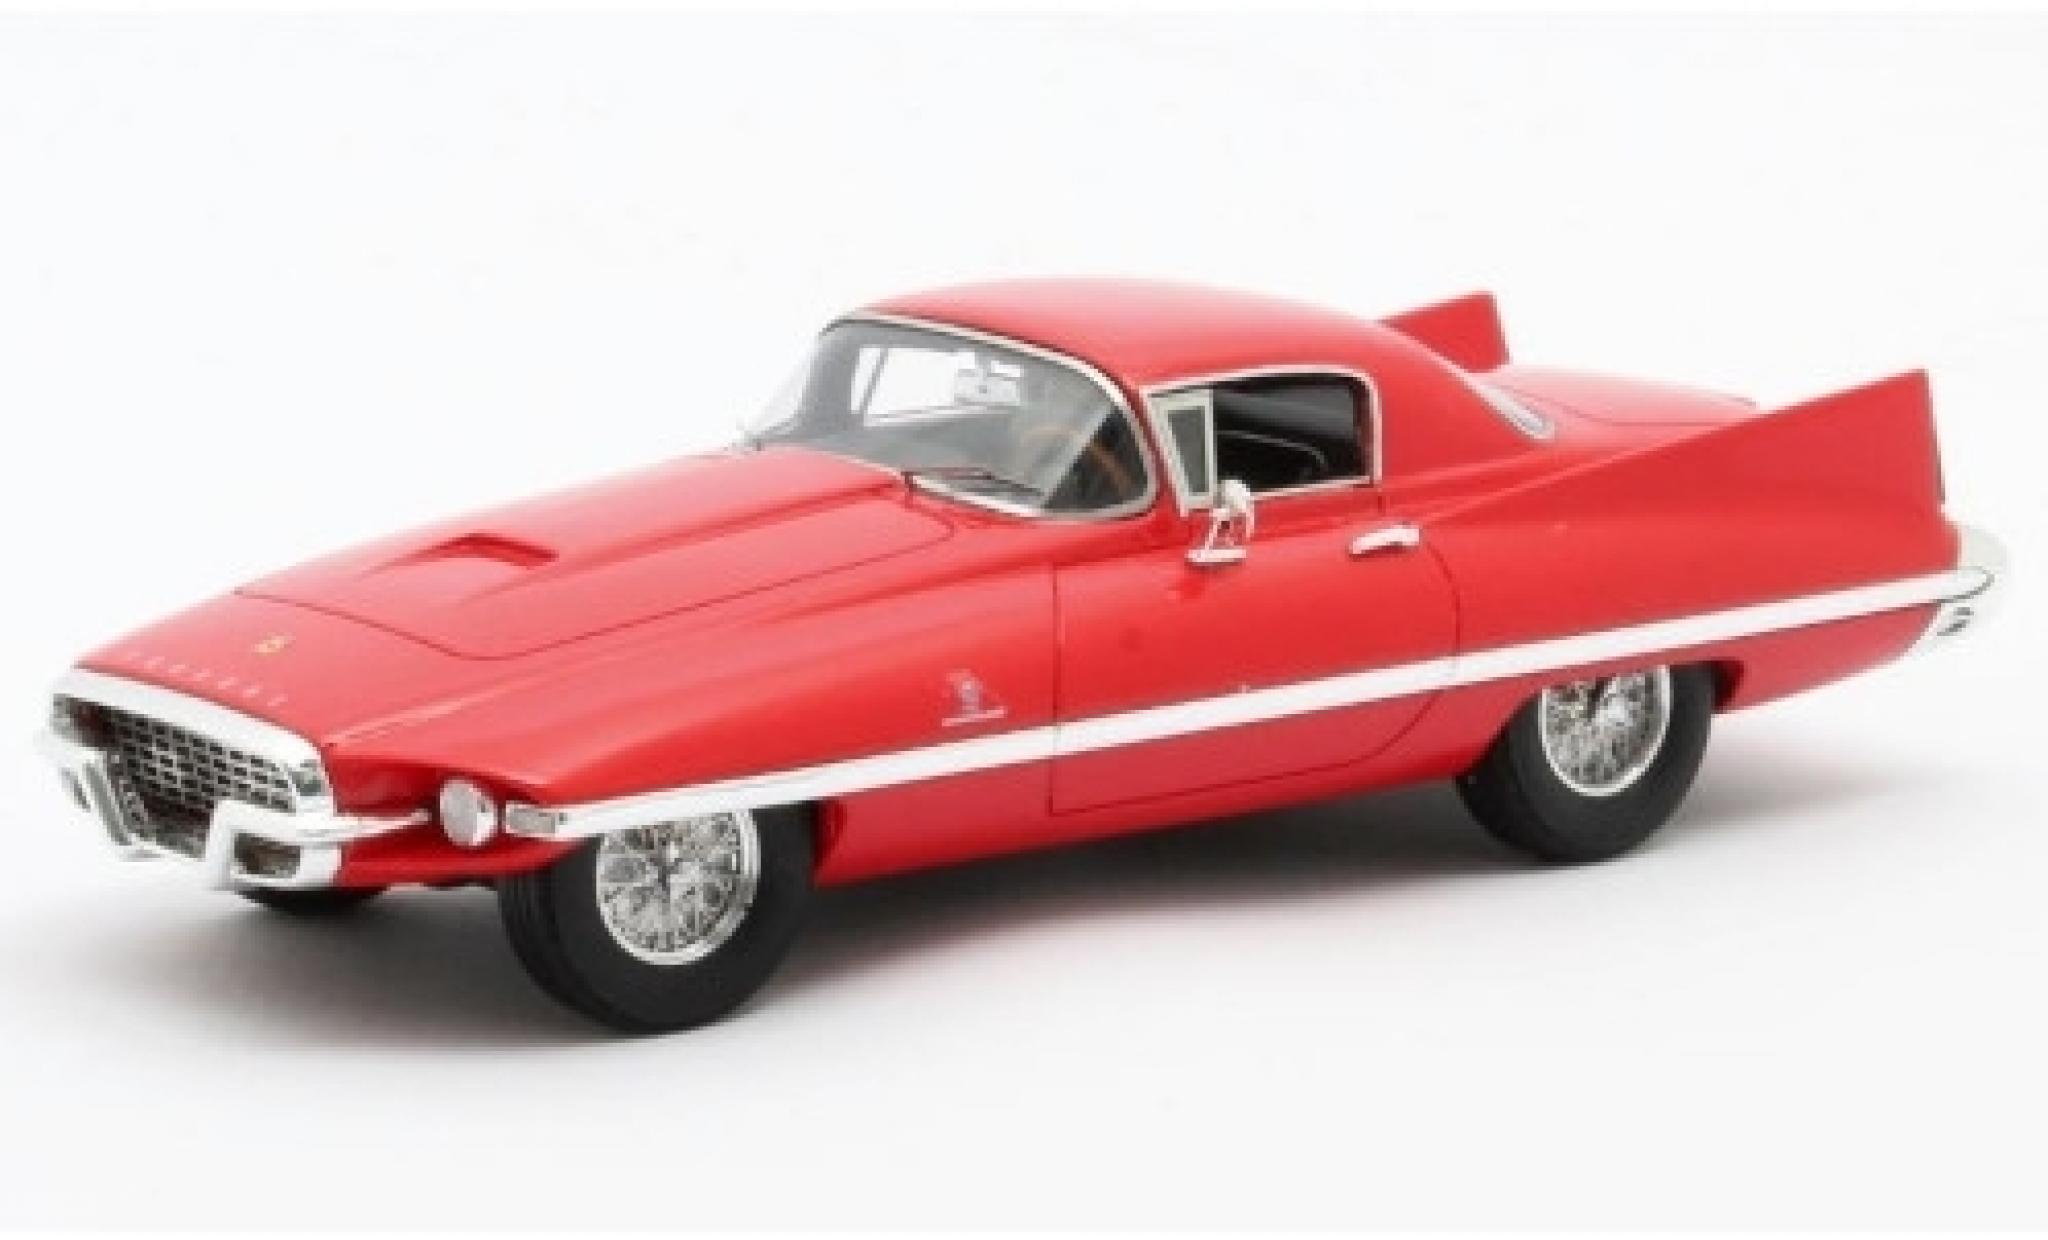 Ferrari 410 1/43 Matrix Superamerica Coupe Ghia red 1955 Fahrgestell-n° 0473SA